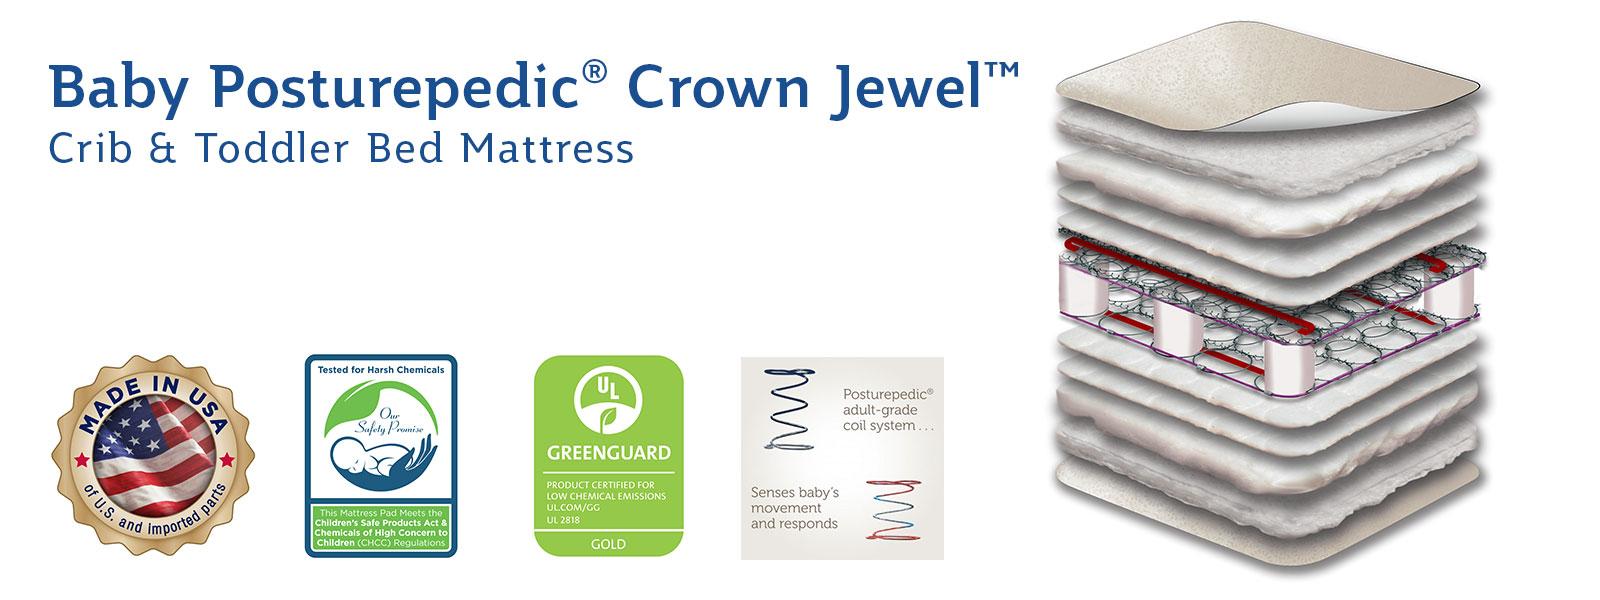 Sealy Posturepedic Crown Jewel Crib Toddler Bed Mattress Sealy Baby